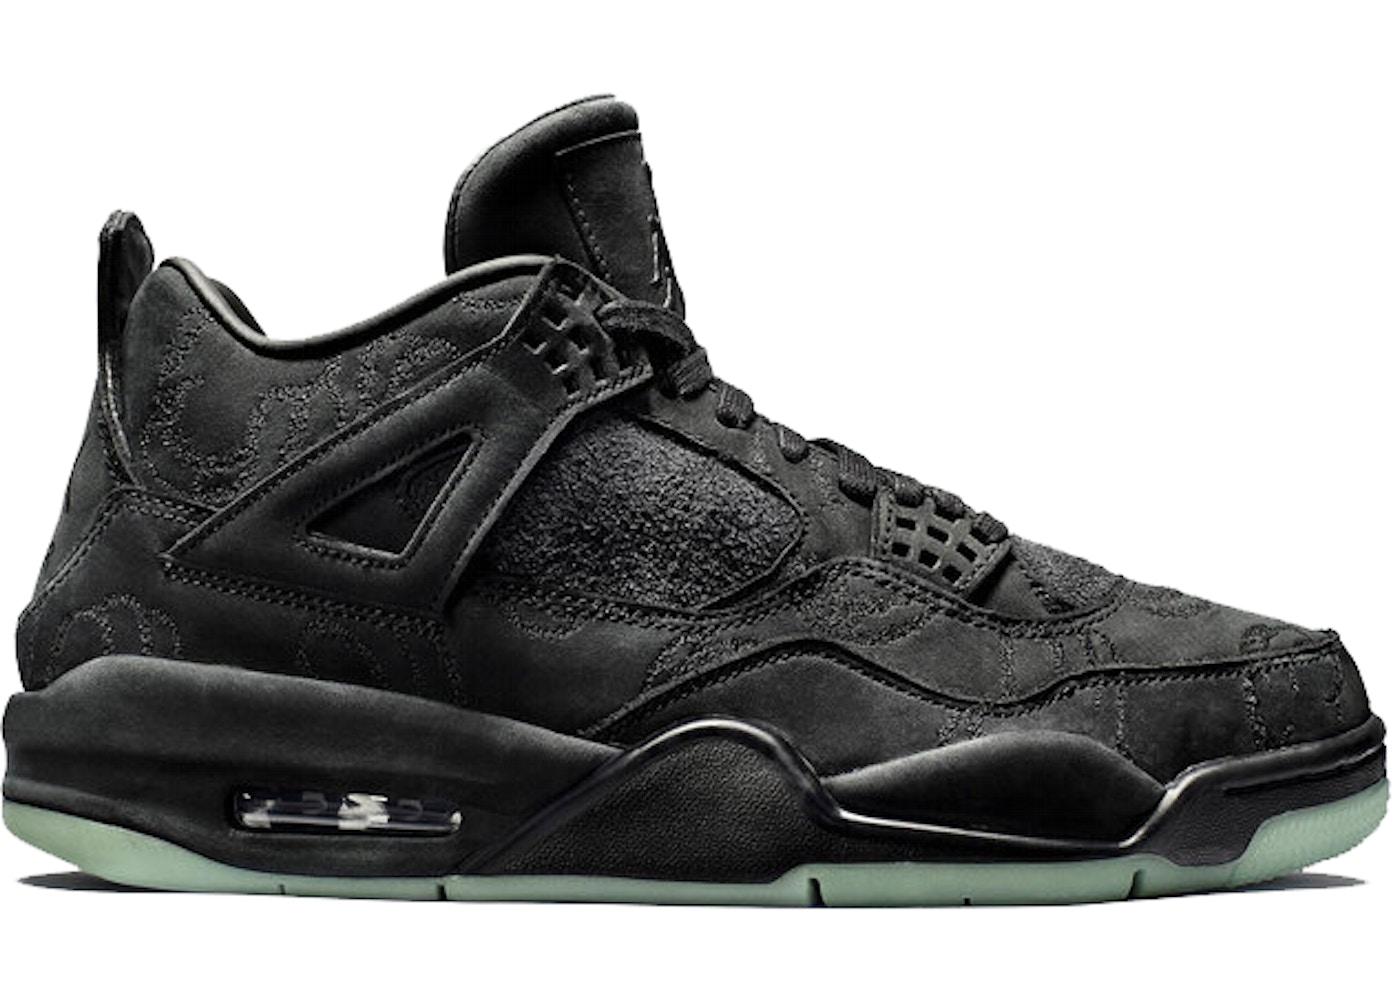 Size 7.5 Shoes - Average Sale Price 4cc013757